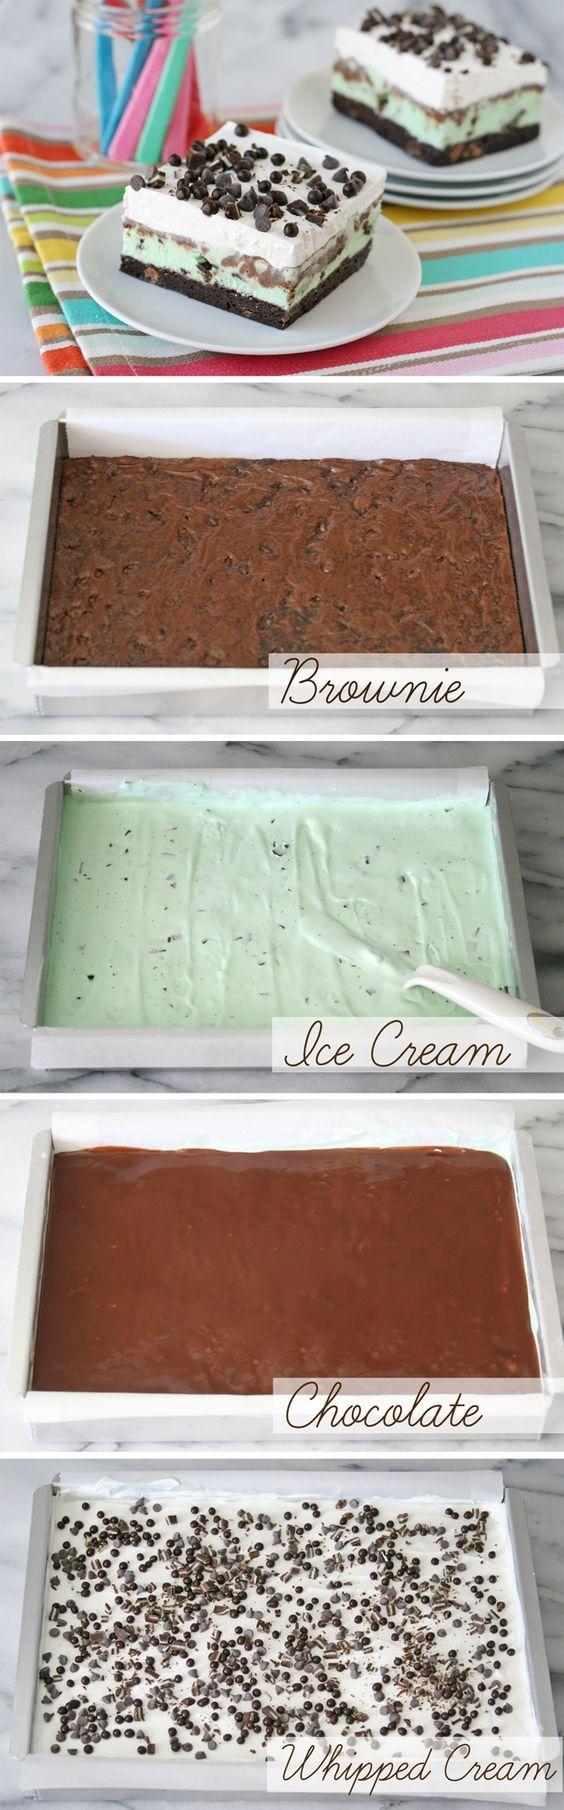 how to make ice bar